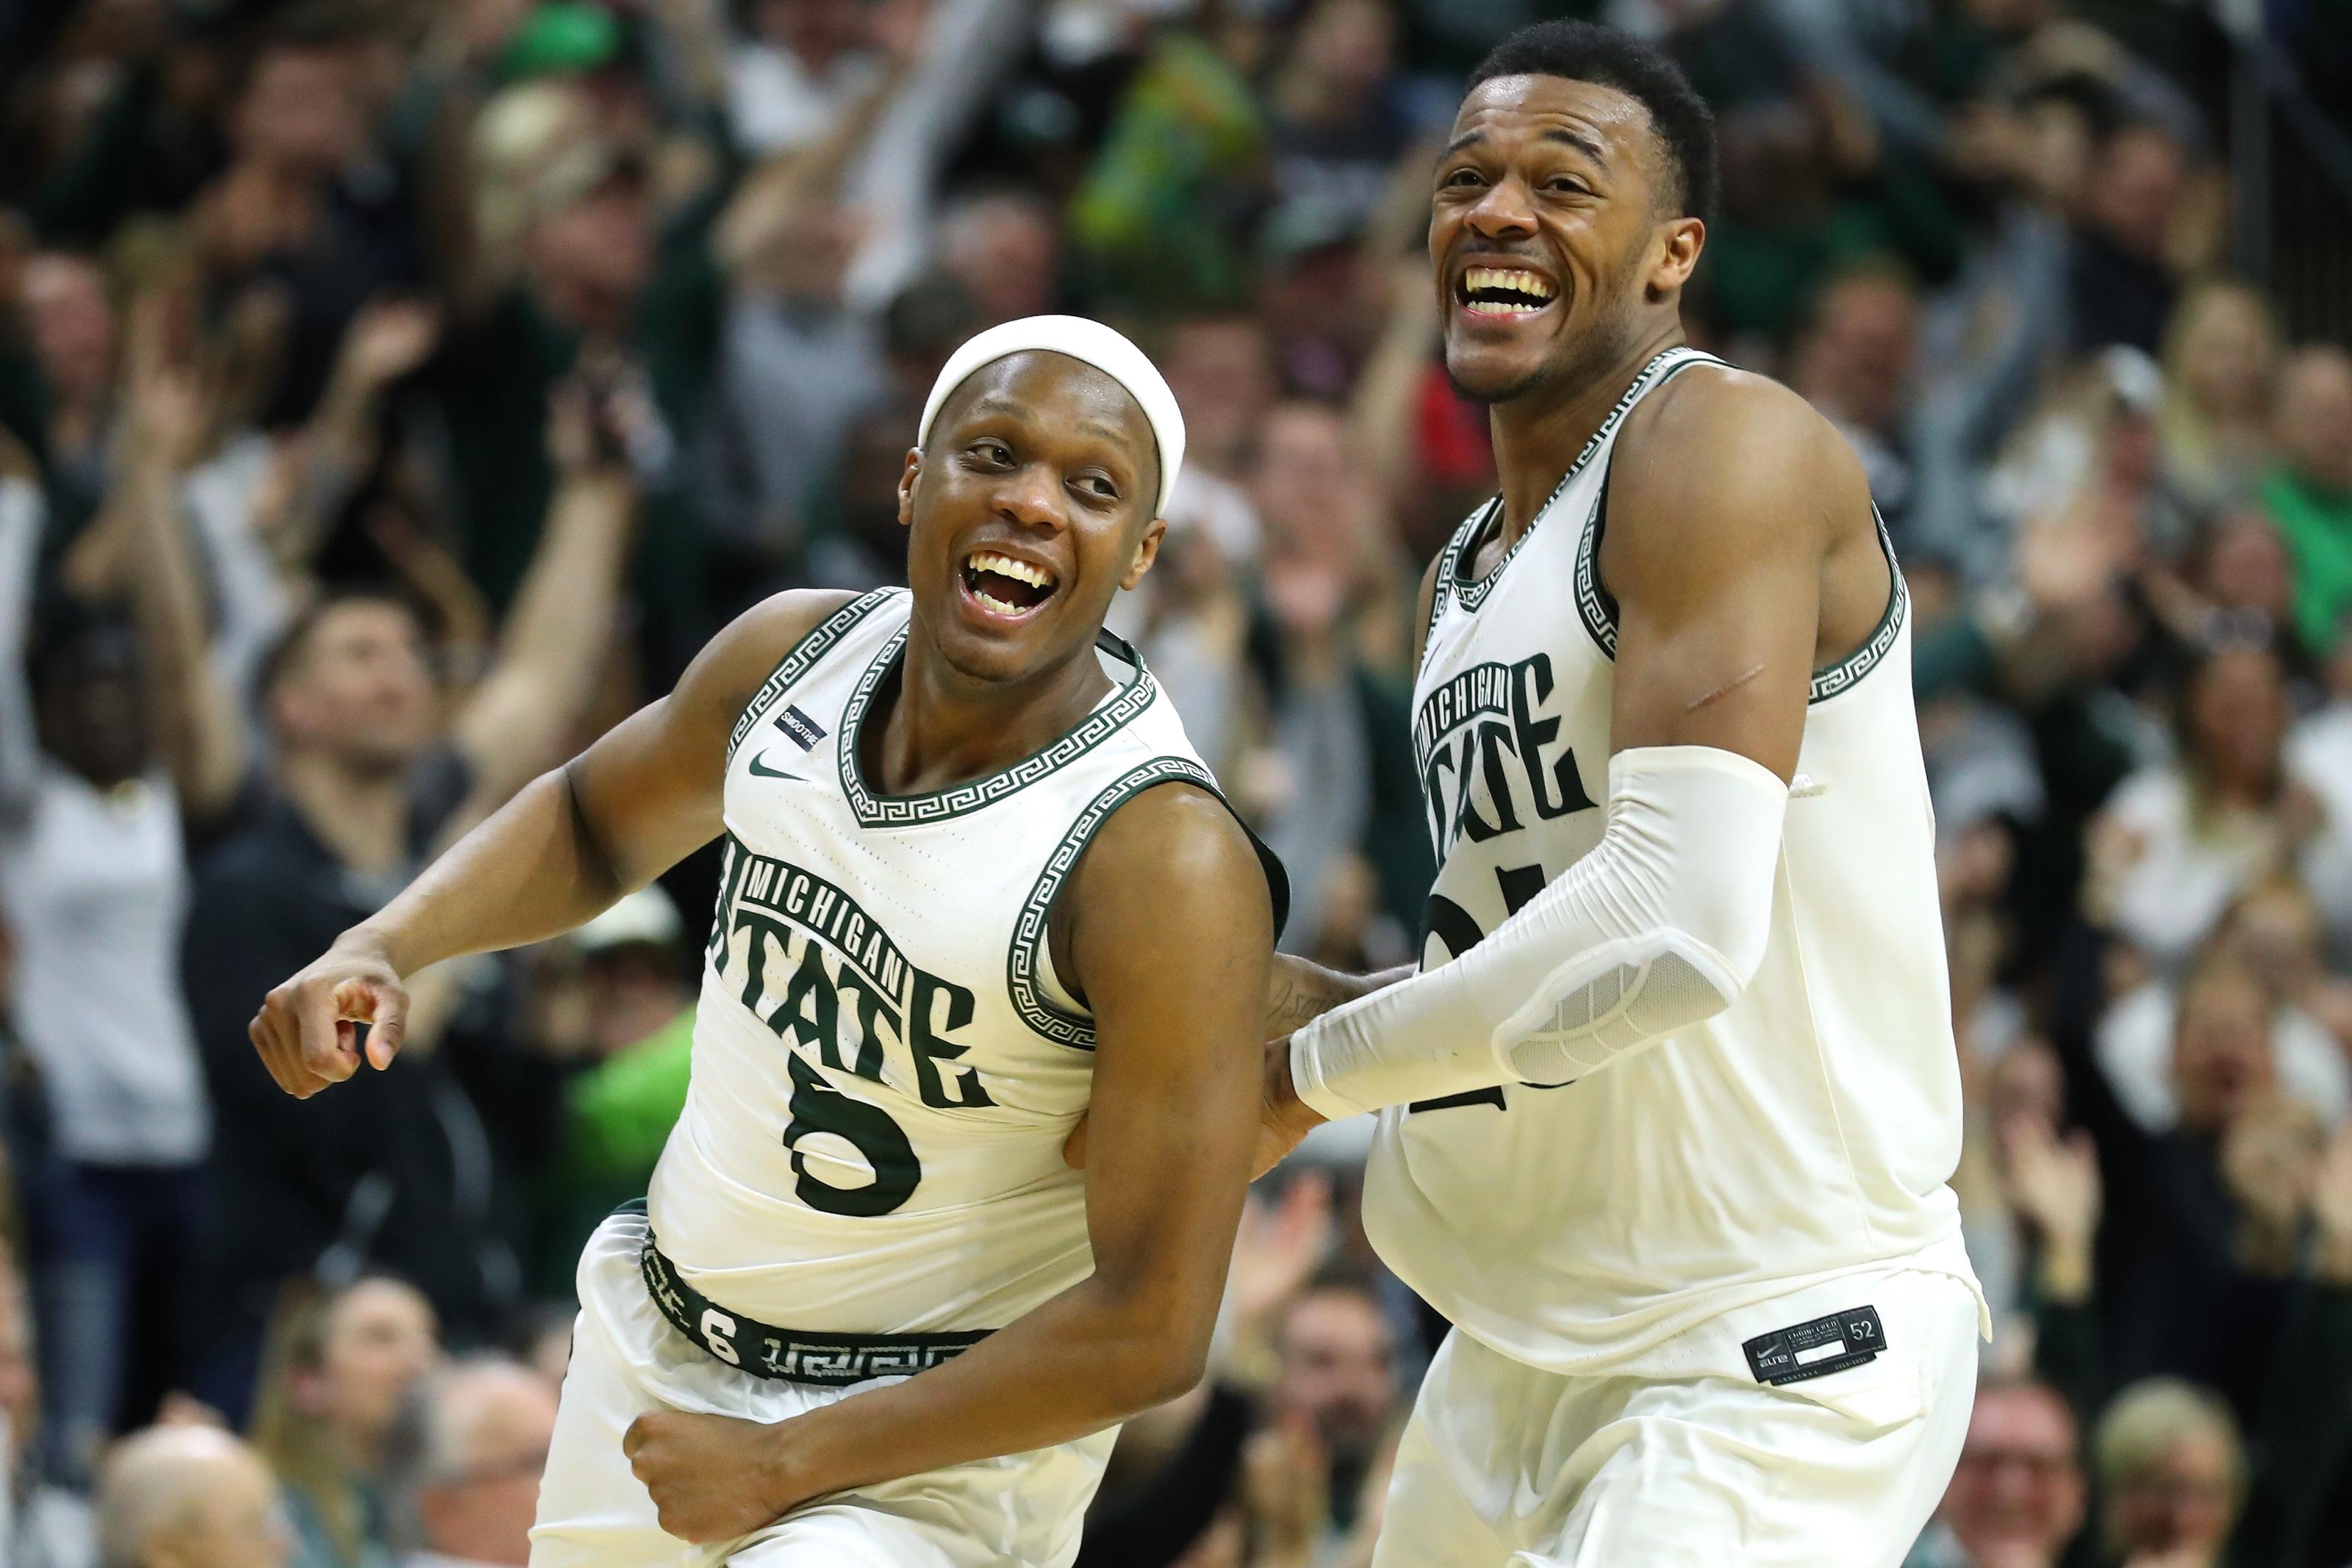 Michigan State Basketball: Final 2019-20 Regular Season